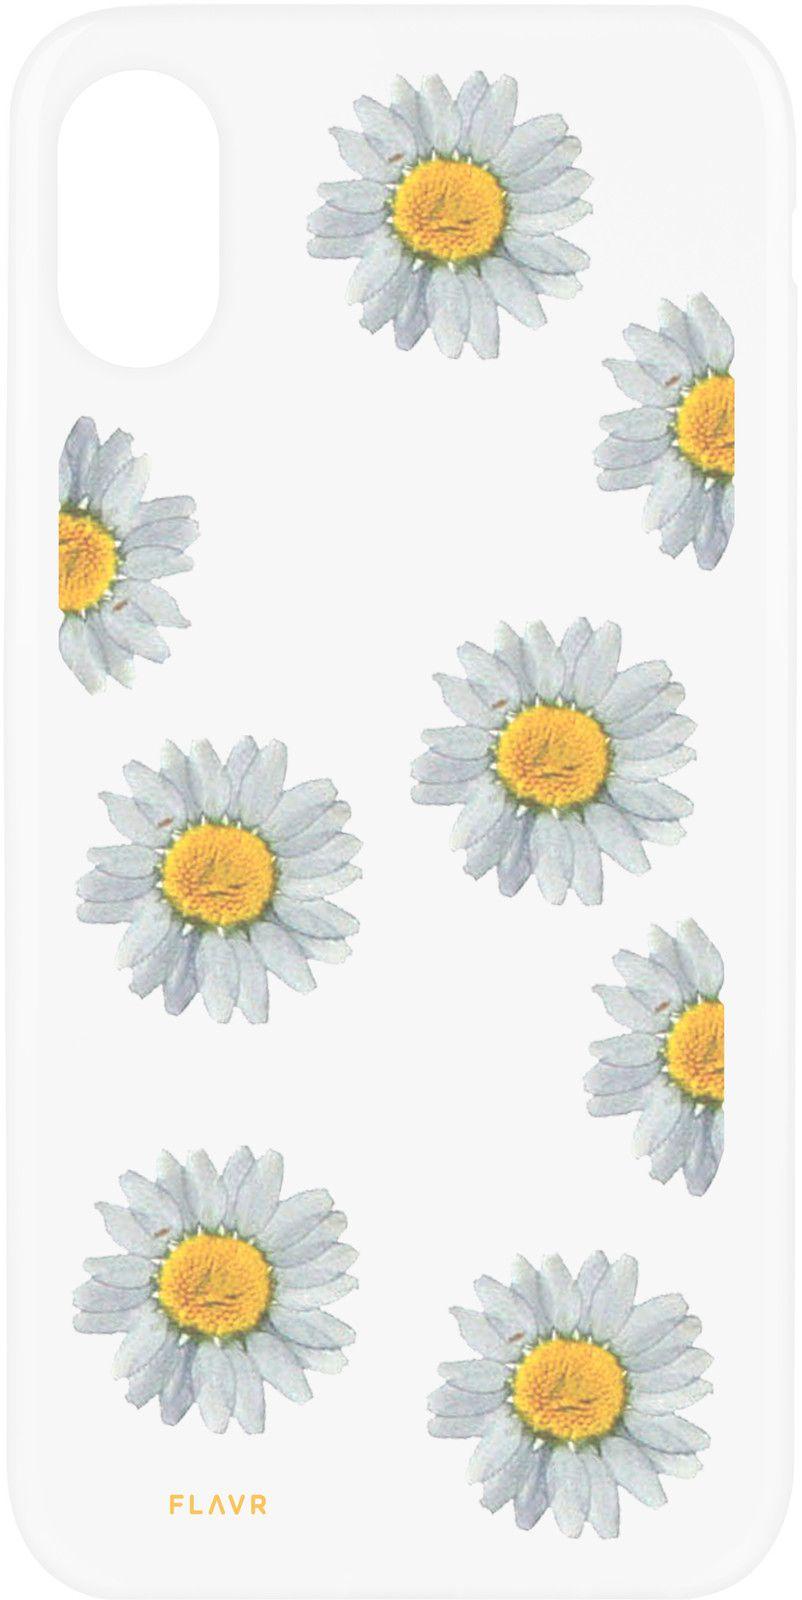 Flavr iPlate Real Flowers Daisy